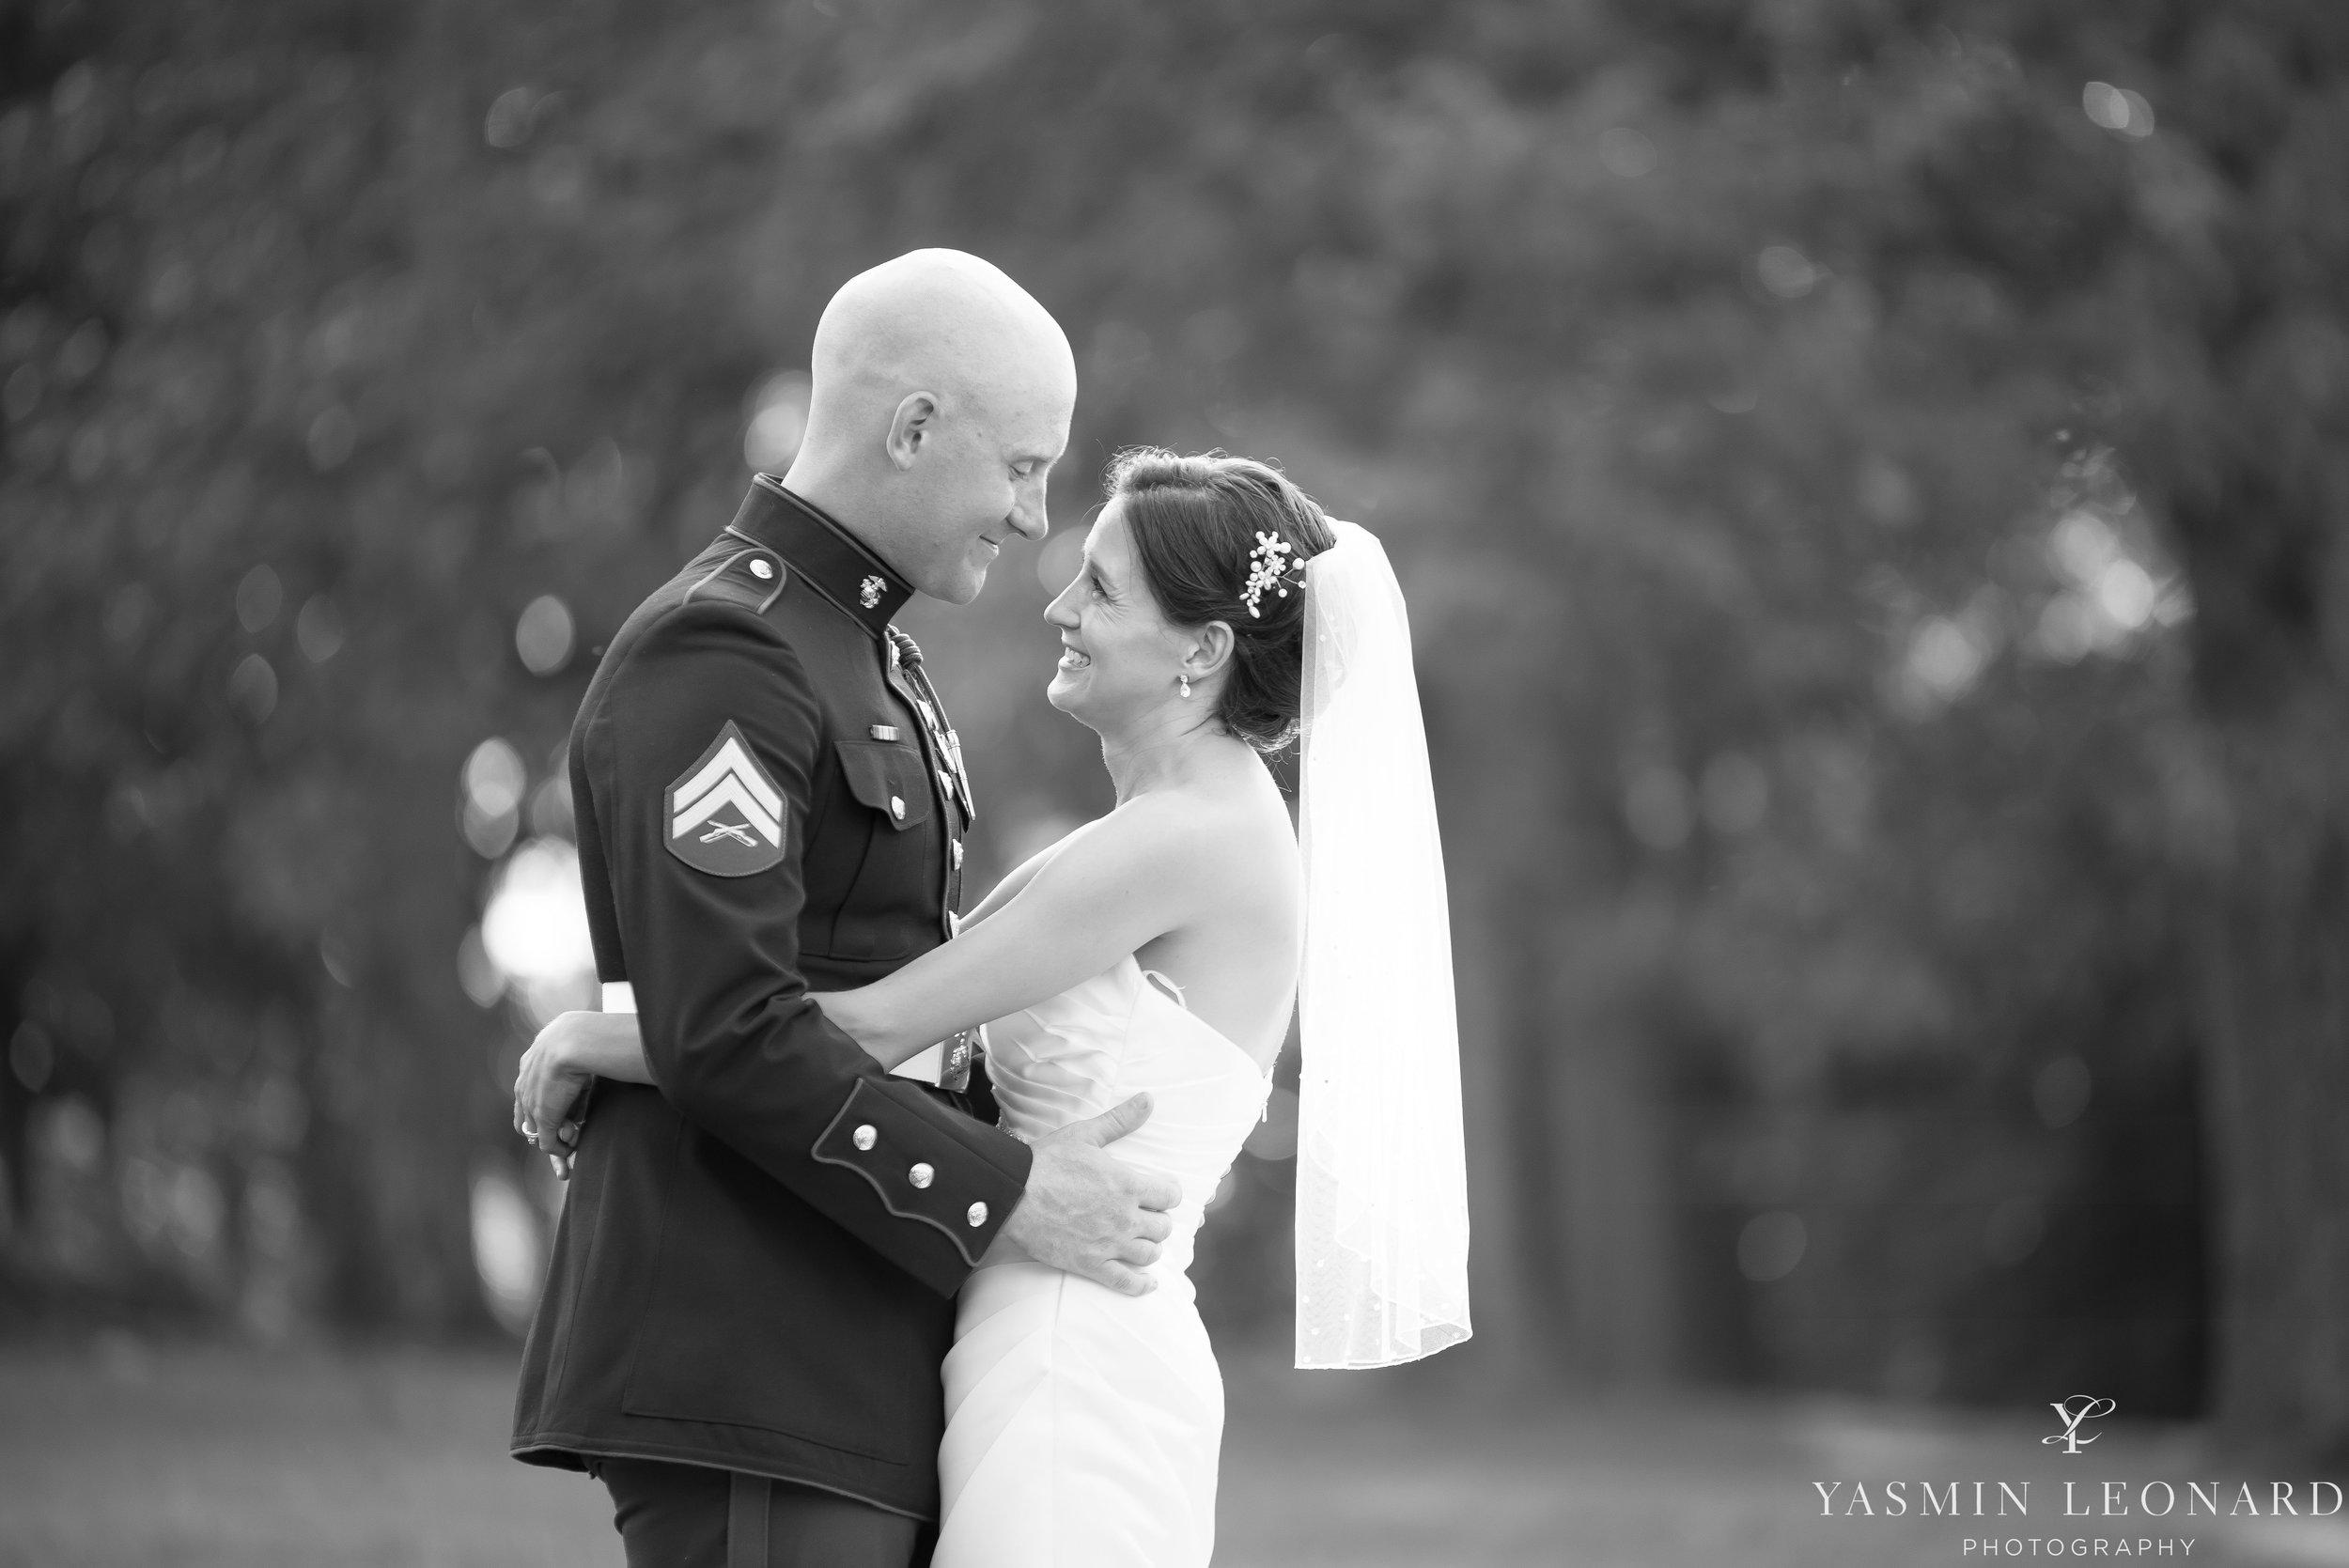 Sara and Nathan | Summerfield Farms | Yasmin Leonard Photography-56.jpg